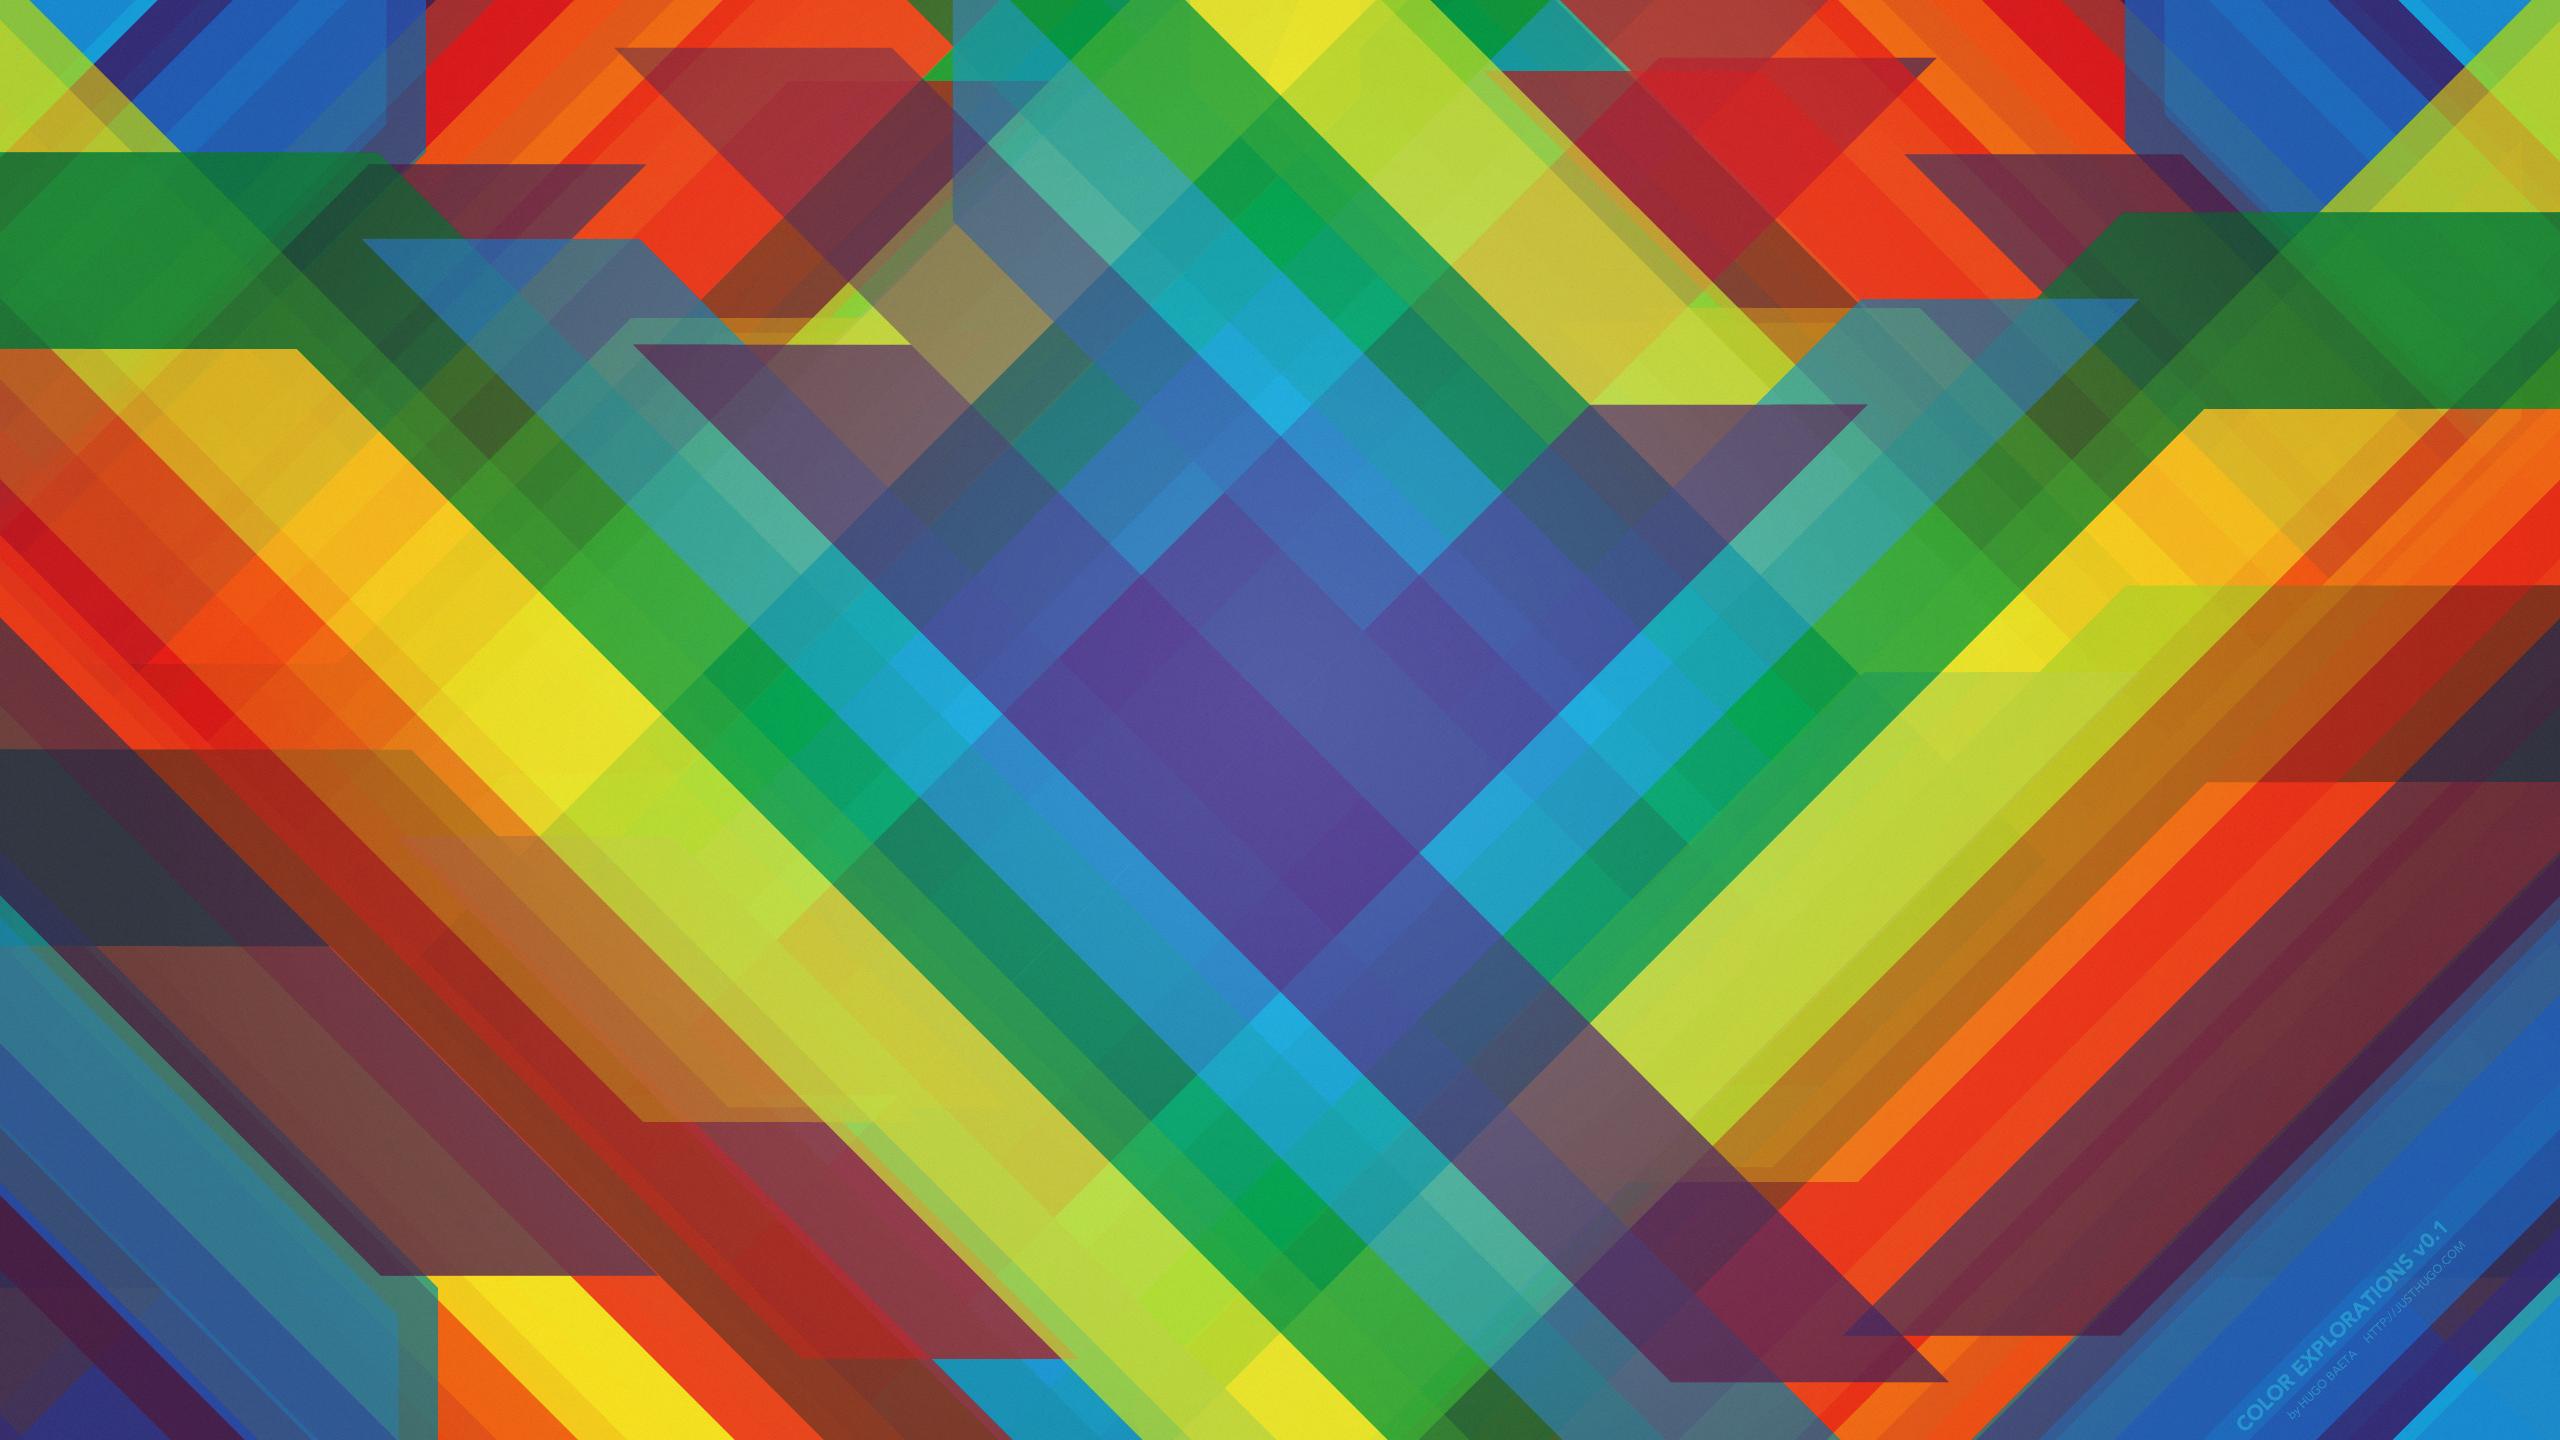 Hugos Color Explorations Funky WallpaperWallpaper DesktopCool BackgroundsBackground